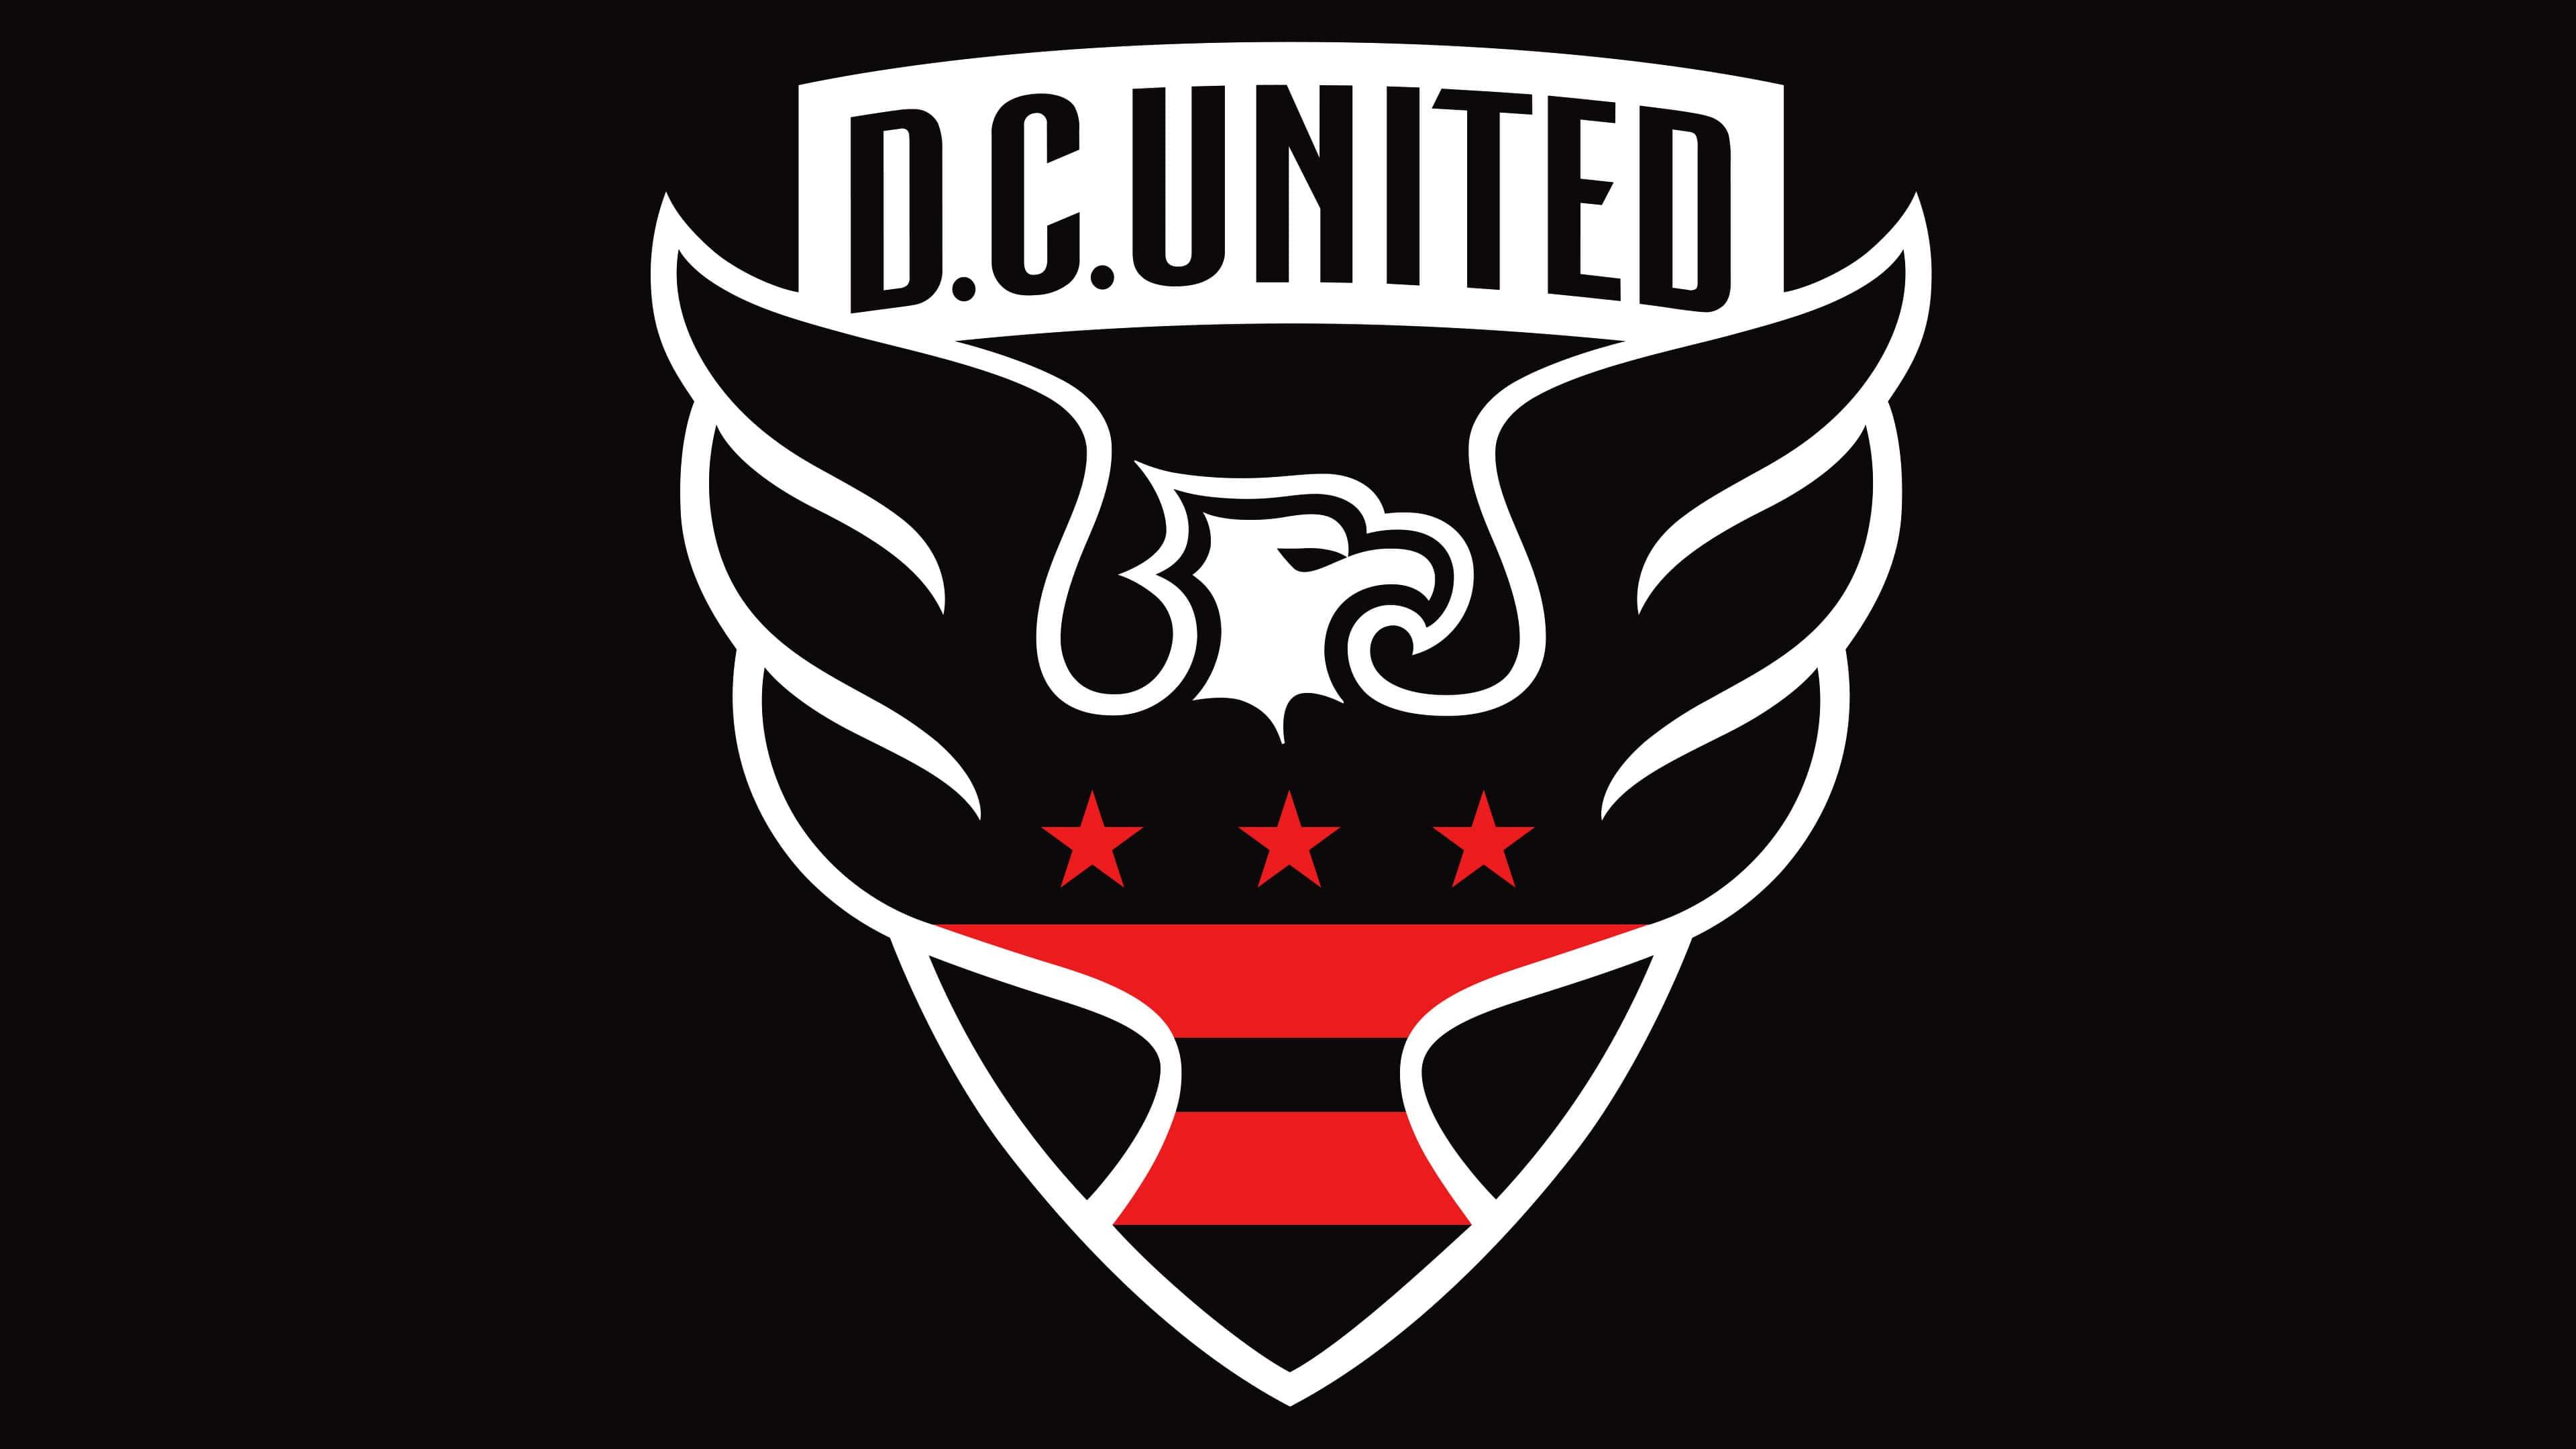 D.C. United Logos.